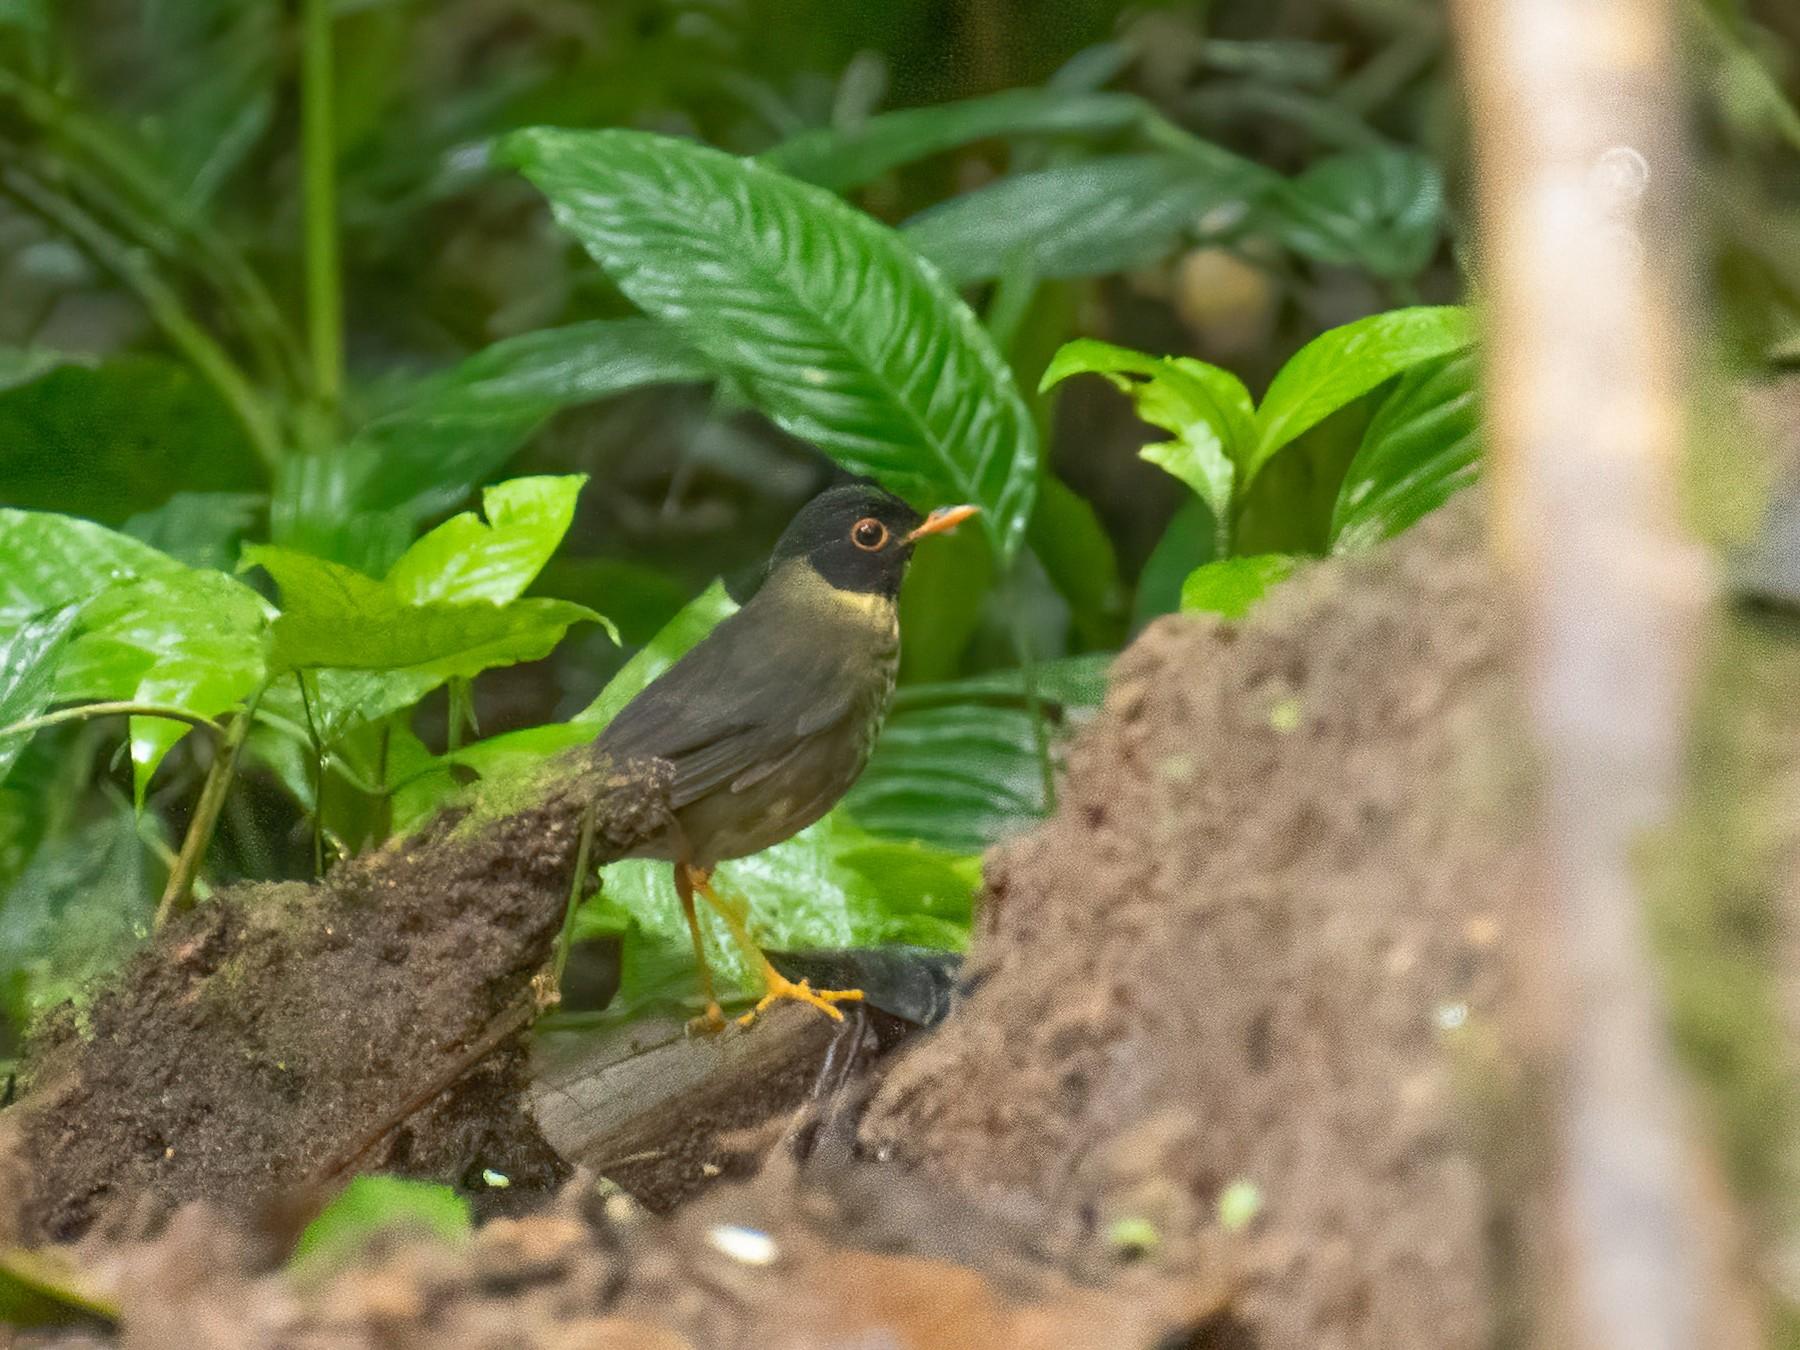 Speckled Nightingale-Thrush - Fran Hartshorn